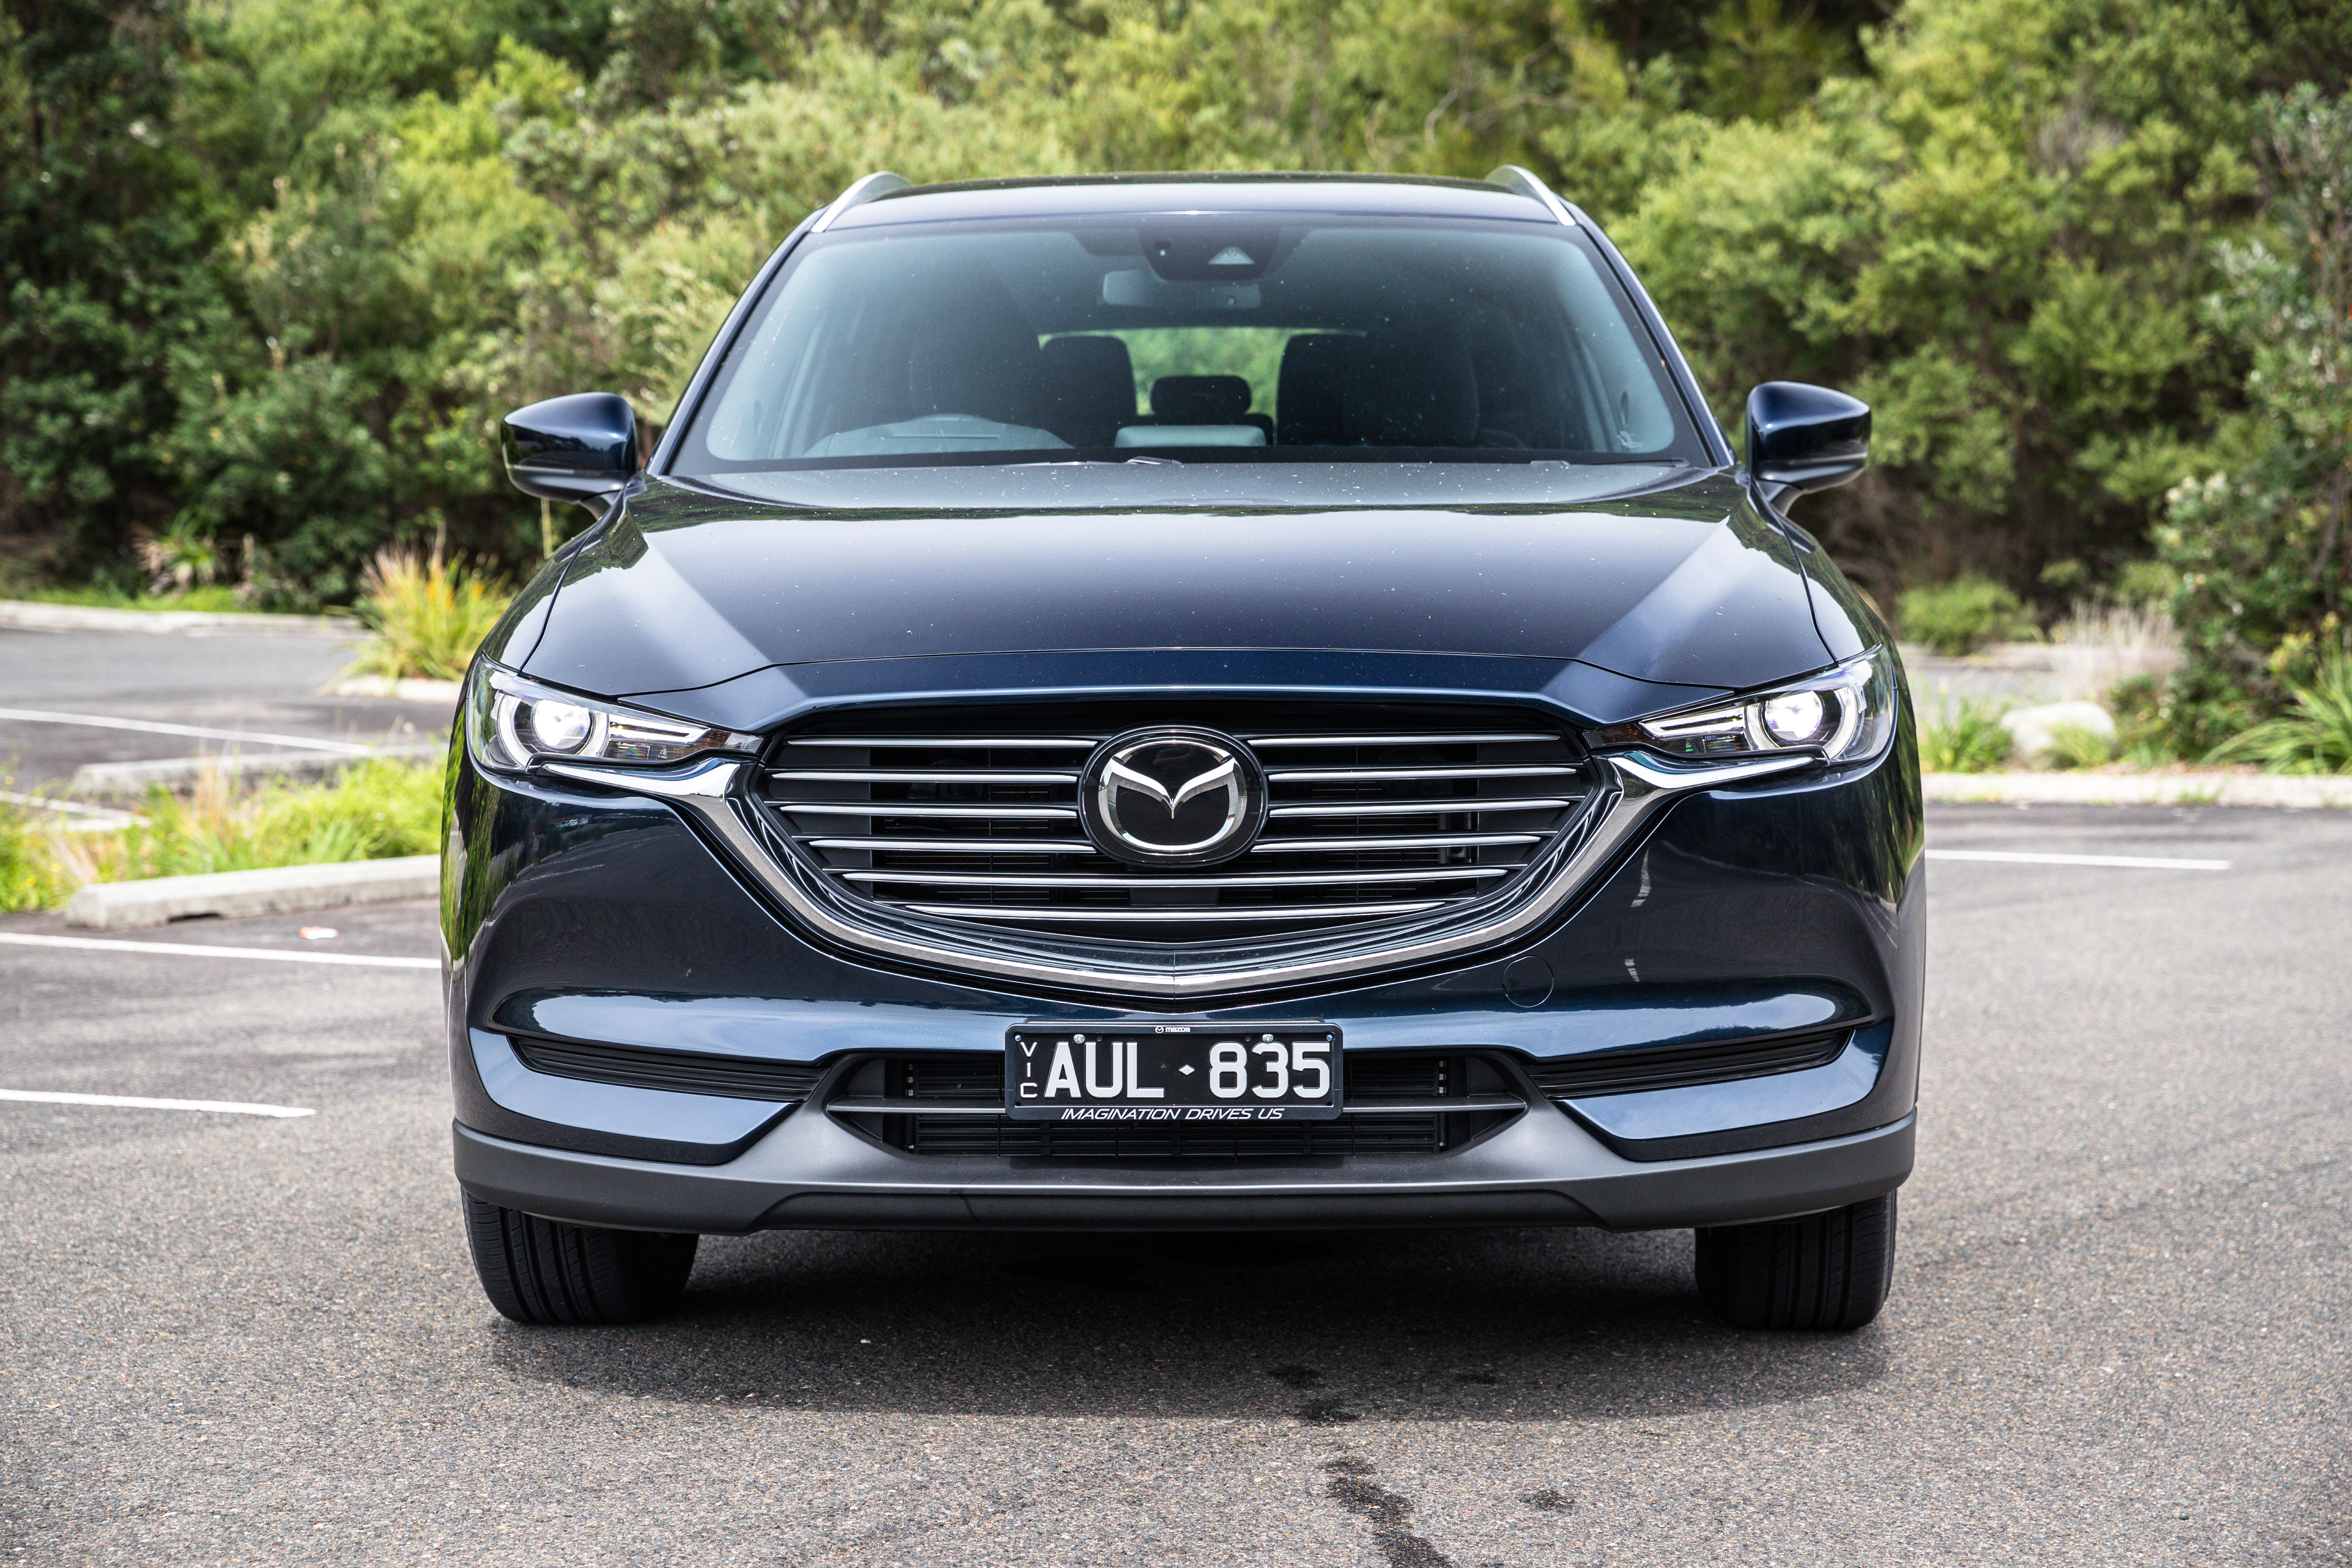 2019 Mazda Cx 8 Gets Apple Carplay Price Hike Caradvice